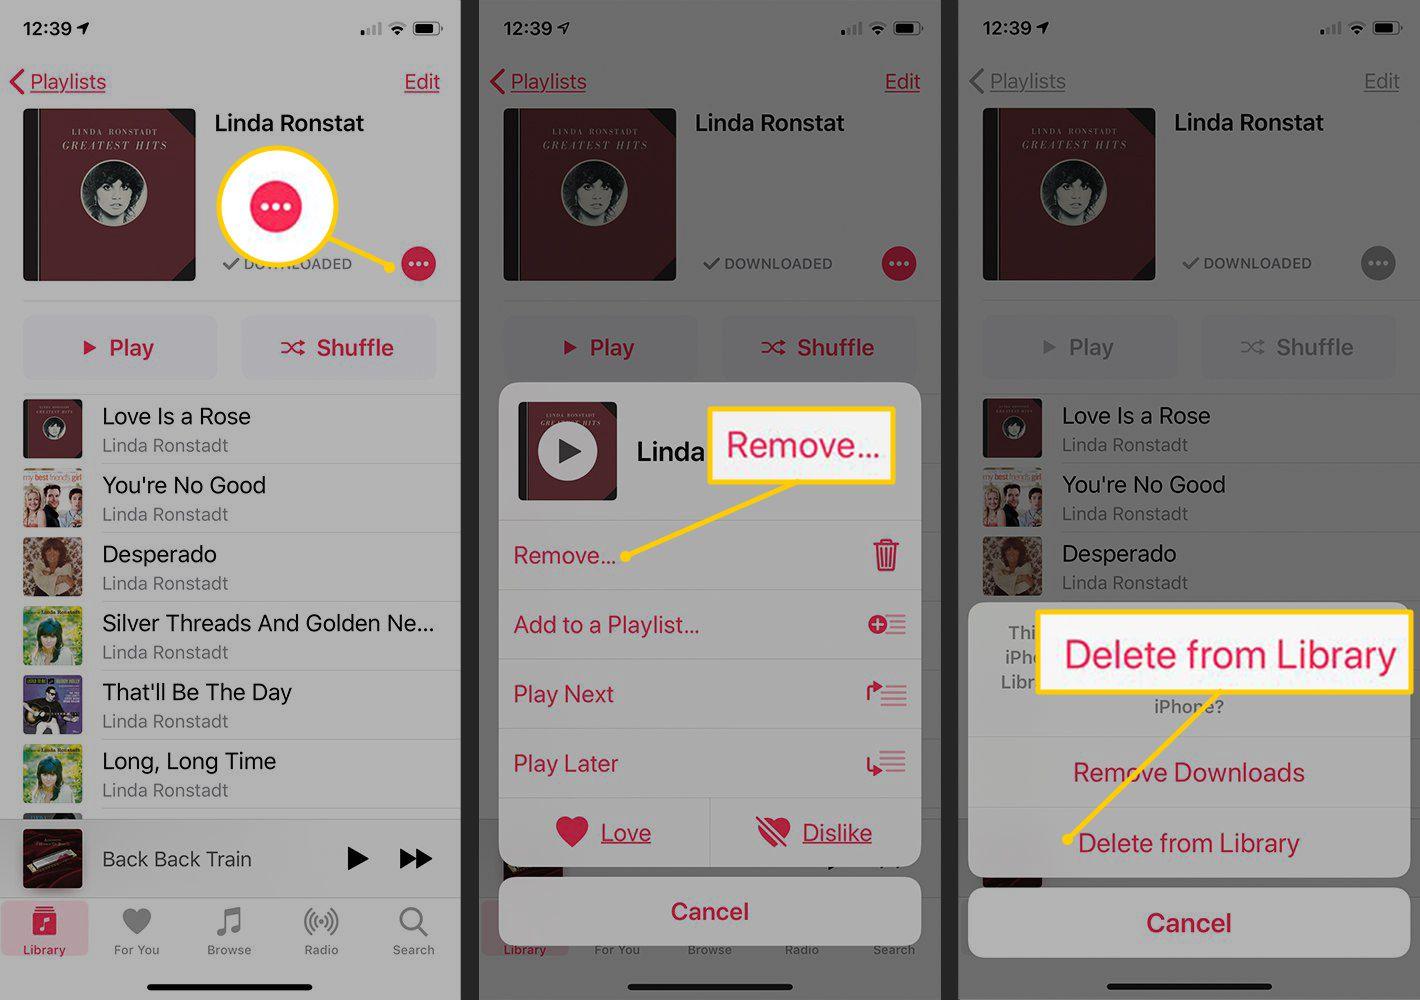 Menu button, Remove, Delete from Library button in iOS Music app